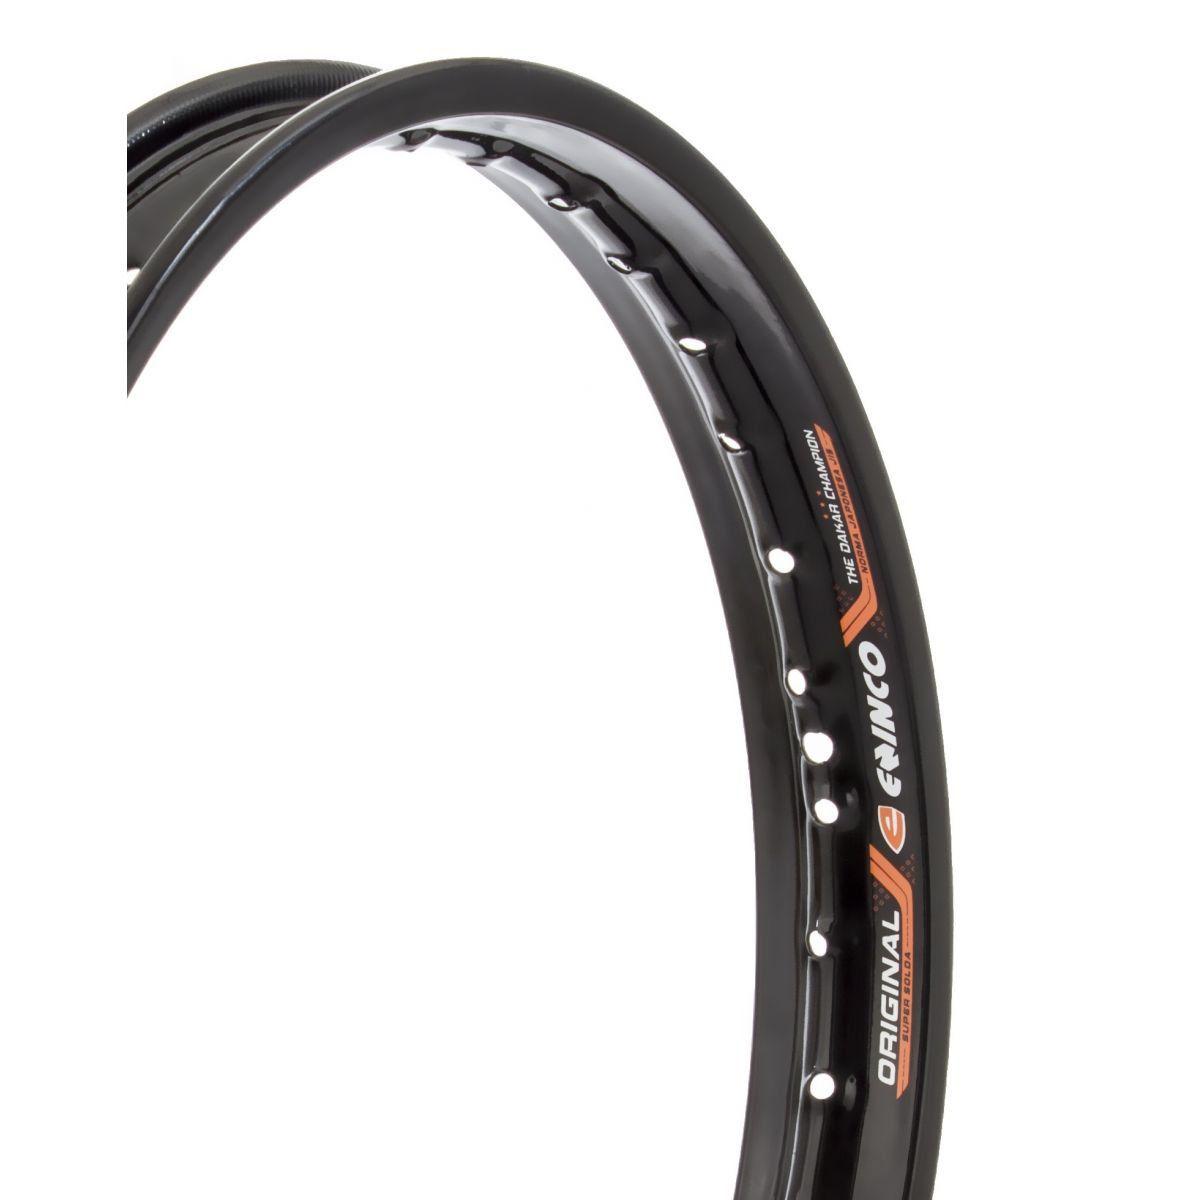 Aro de Moto Traseiro Honda Biz 100 / Biz 125 / Pop 100 - 1.60 X 14 - Preto - Eninco